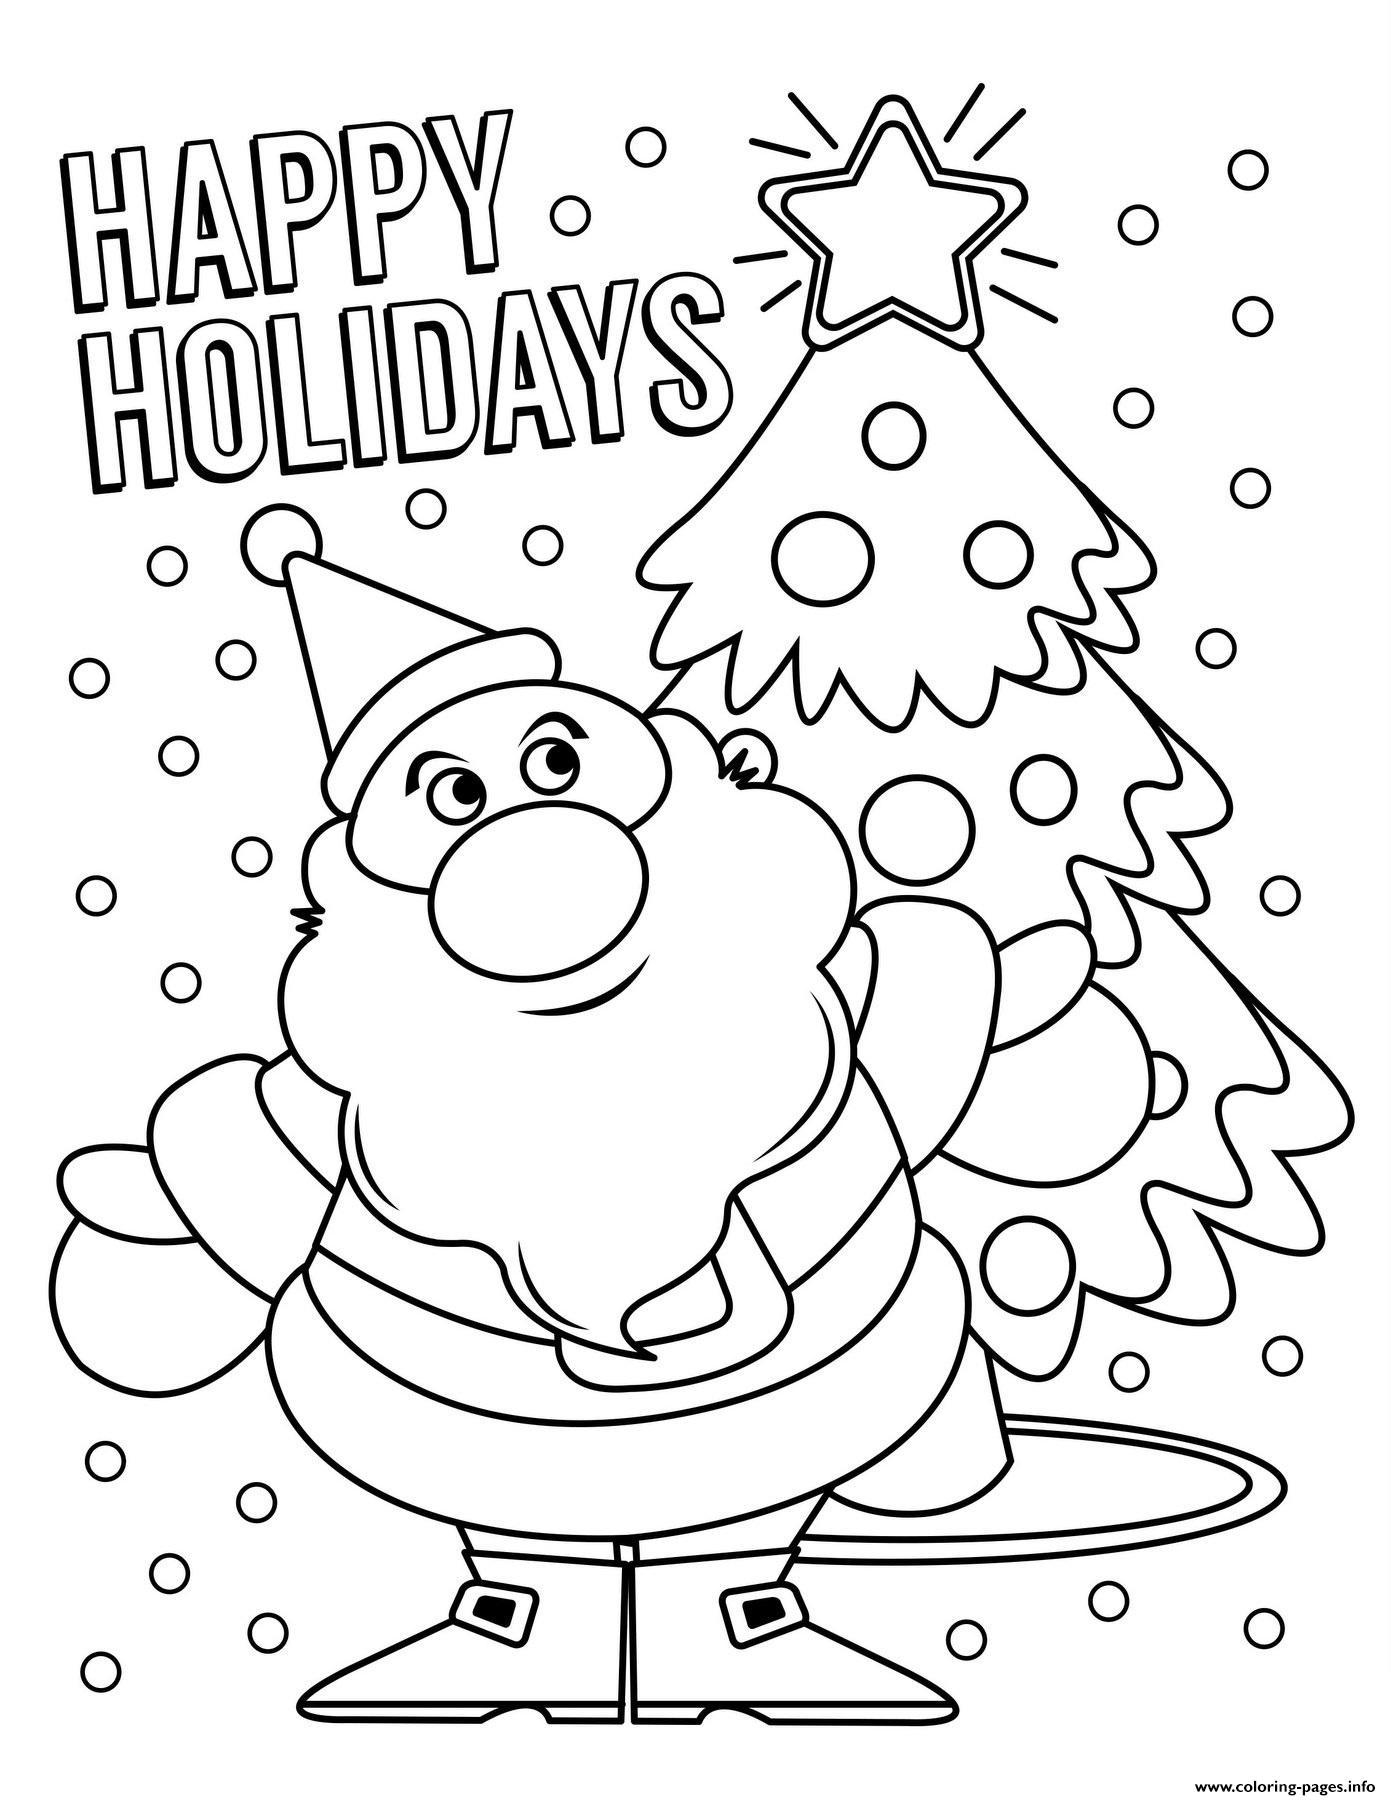 Happy Holidays Santa Claus Coloring Pages Printable